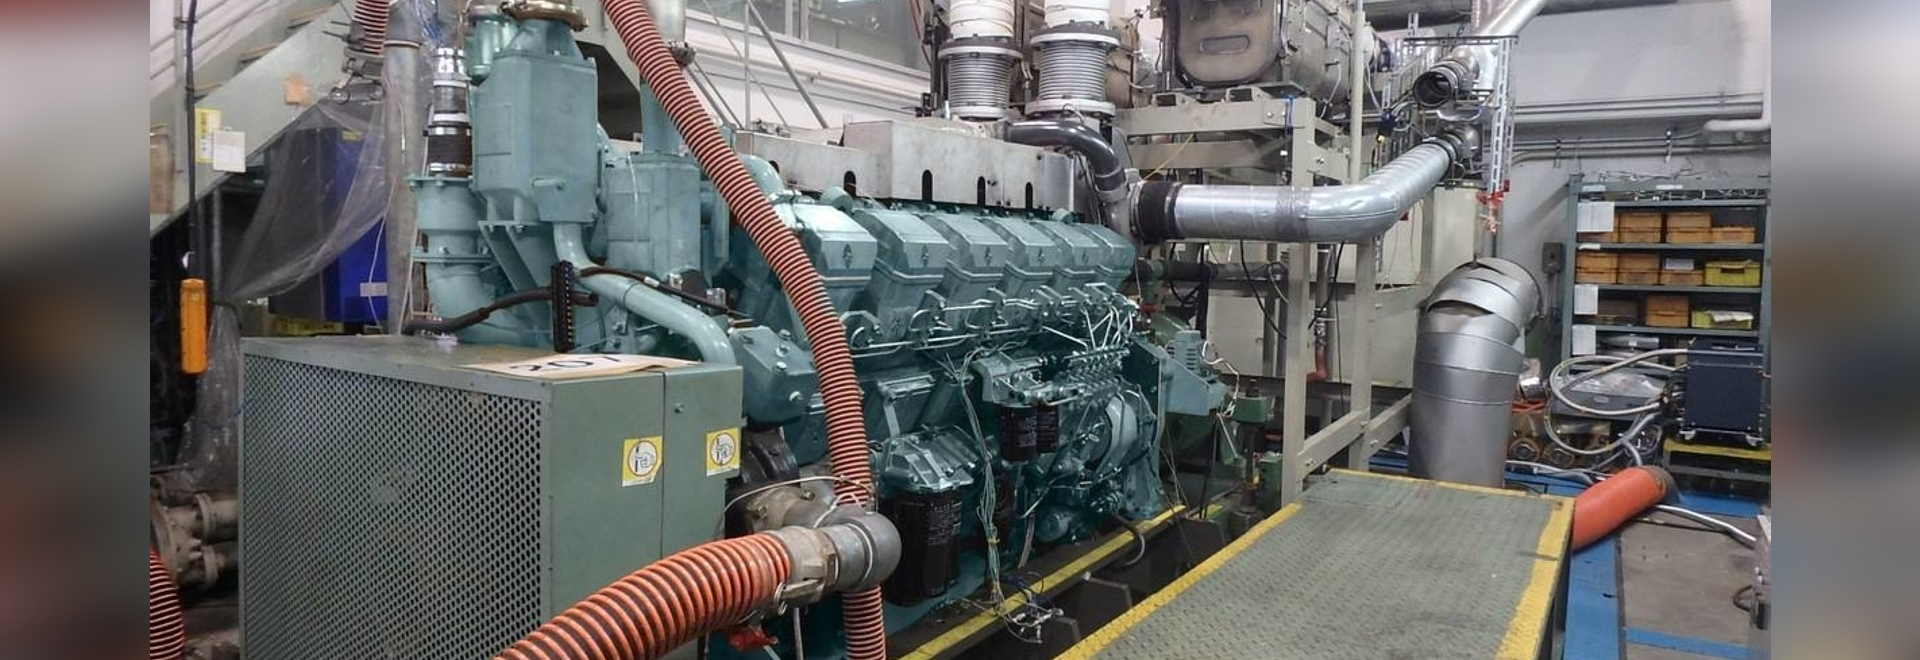 Mitsubishi S12 R engine installed